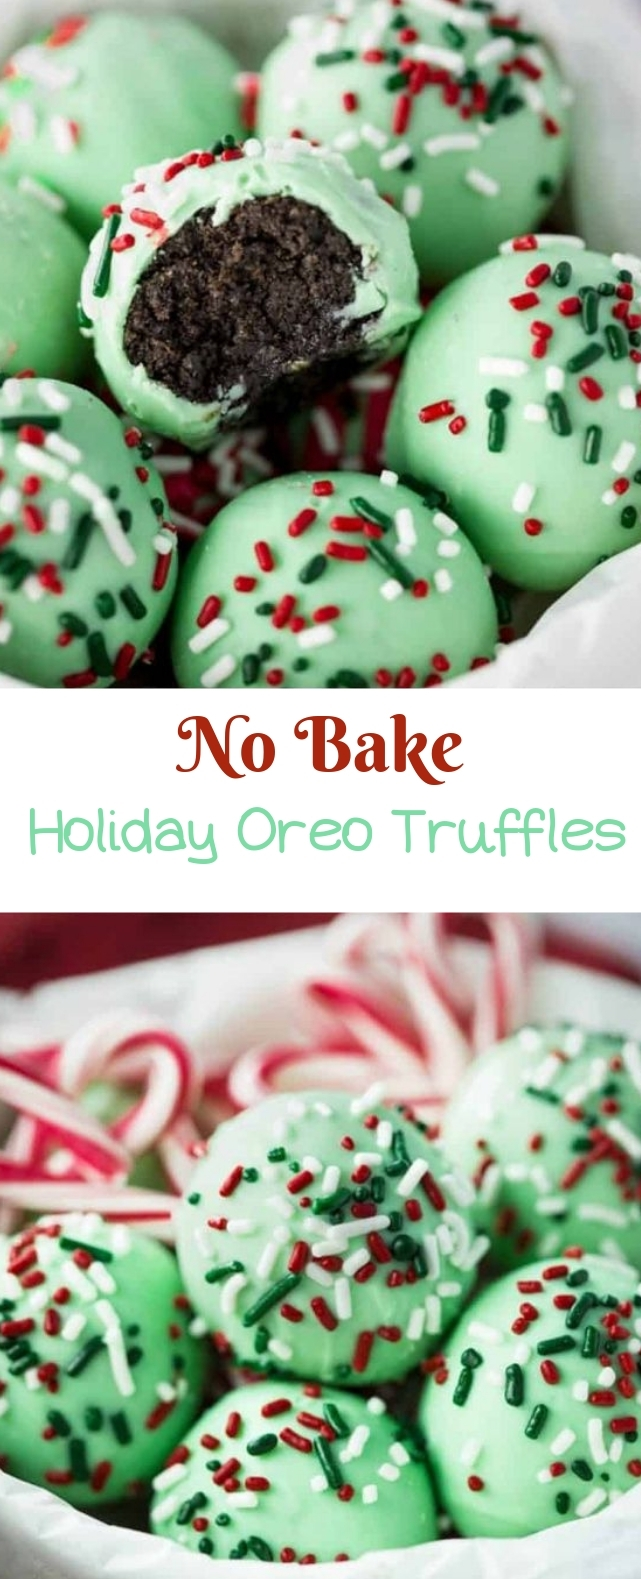 No Bake Holiday Oreo Truffles #truffles #dessert